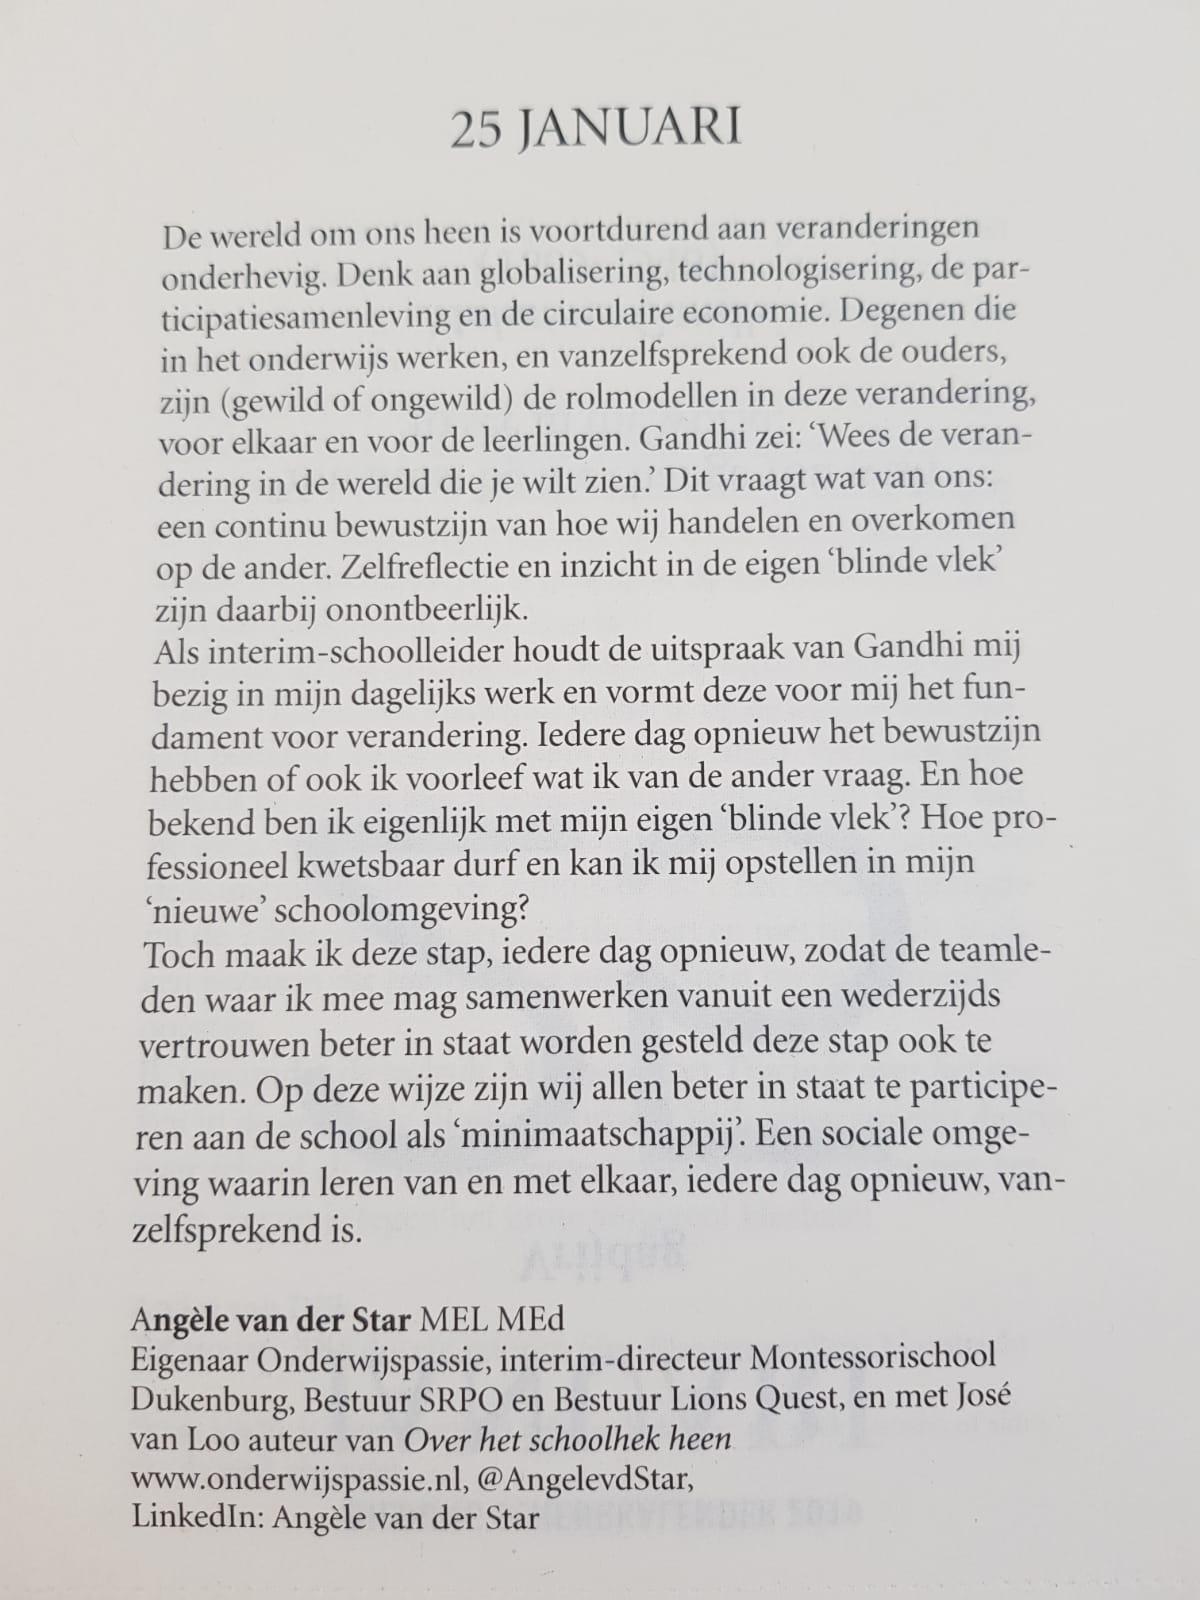 Bildung-2019-tekst-AS.png